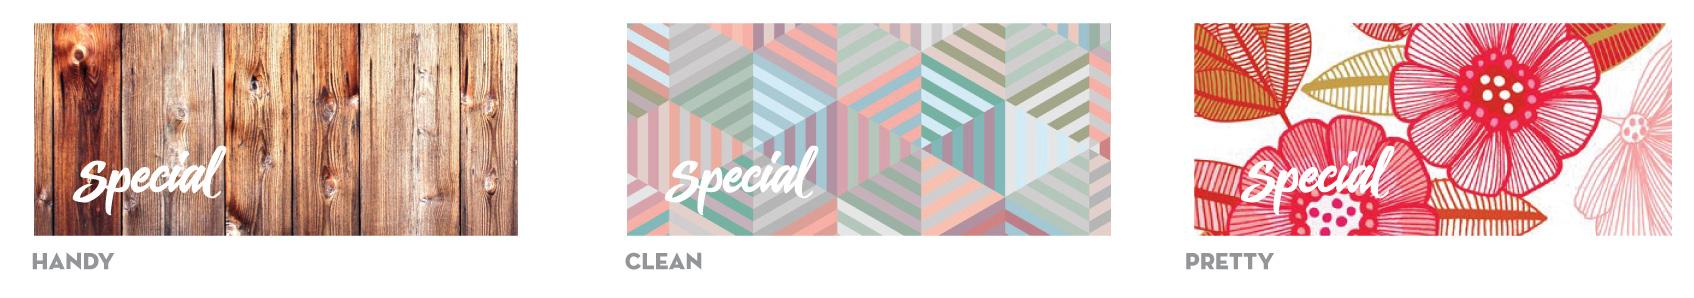 special-final-logo-textural.jpg